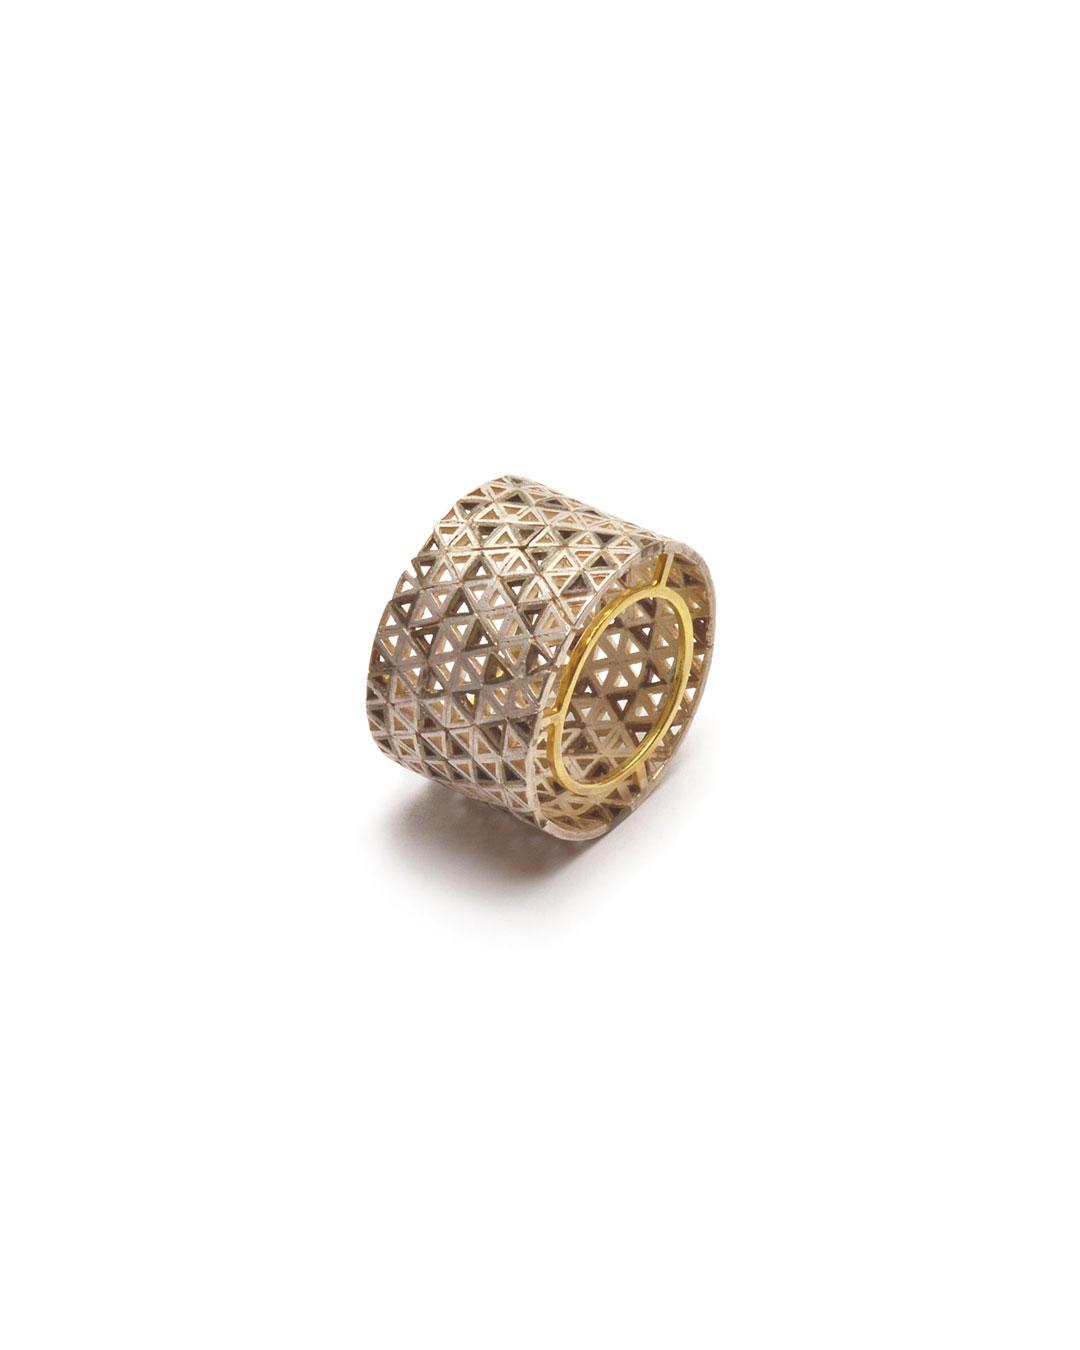 Stefano Marchetti, untitled, 2015, ring; gold, silver, 28 x 28 x 18 mm, €4000